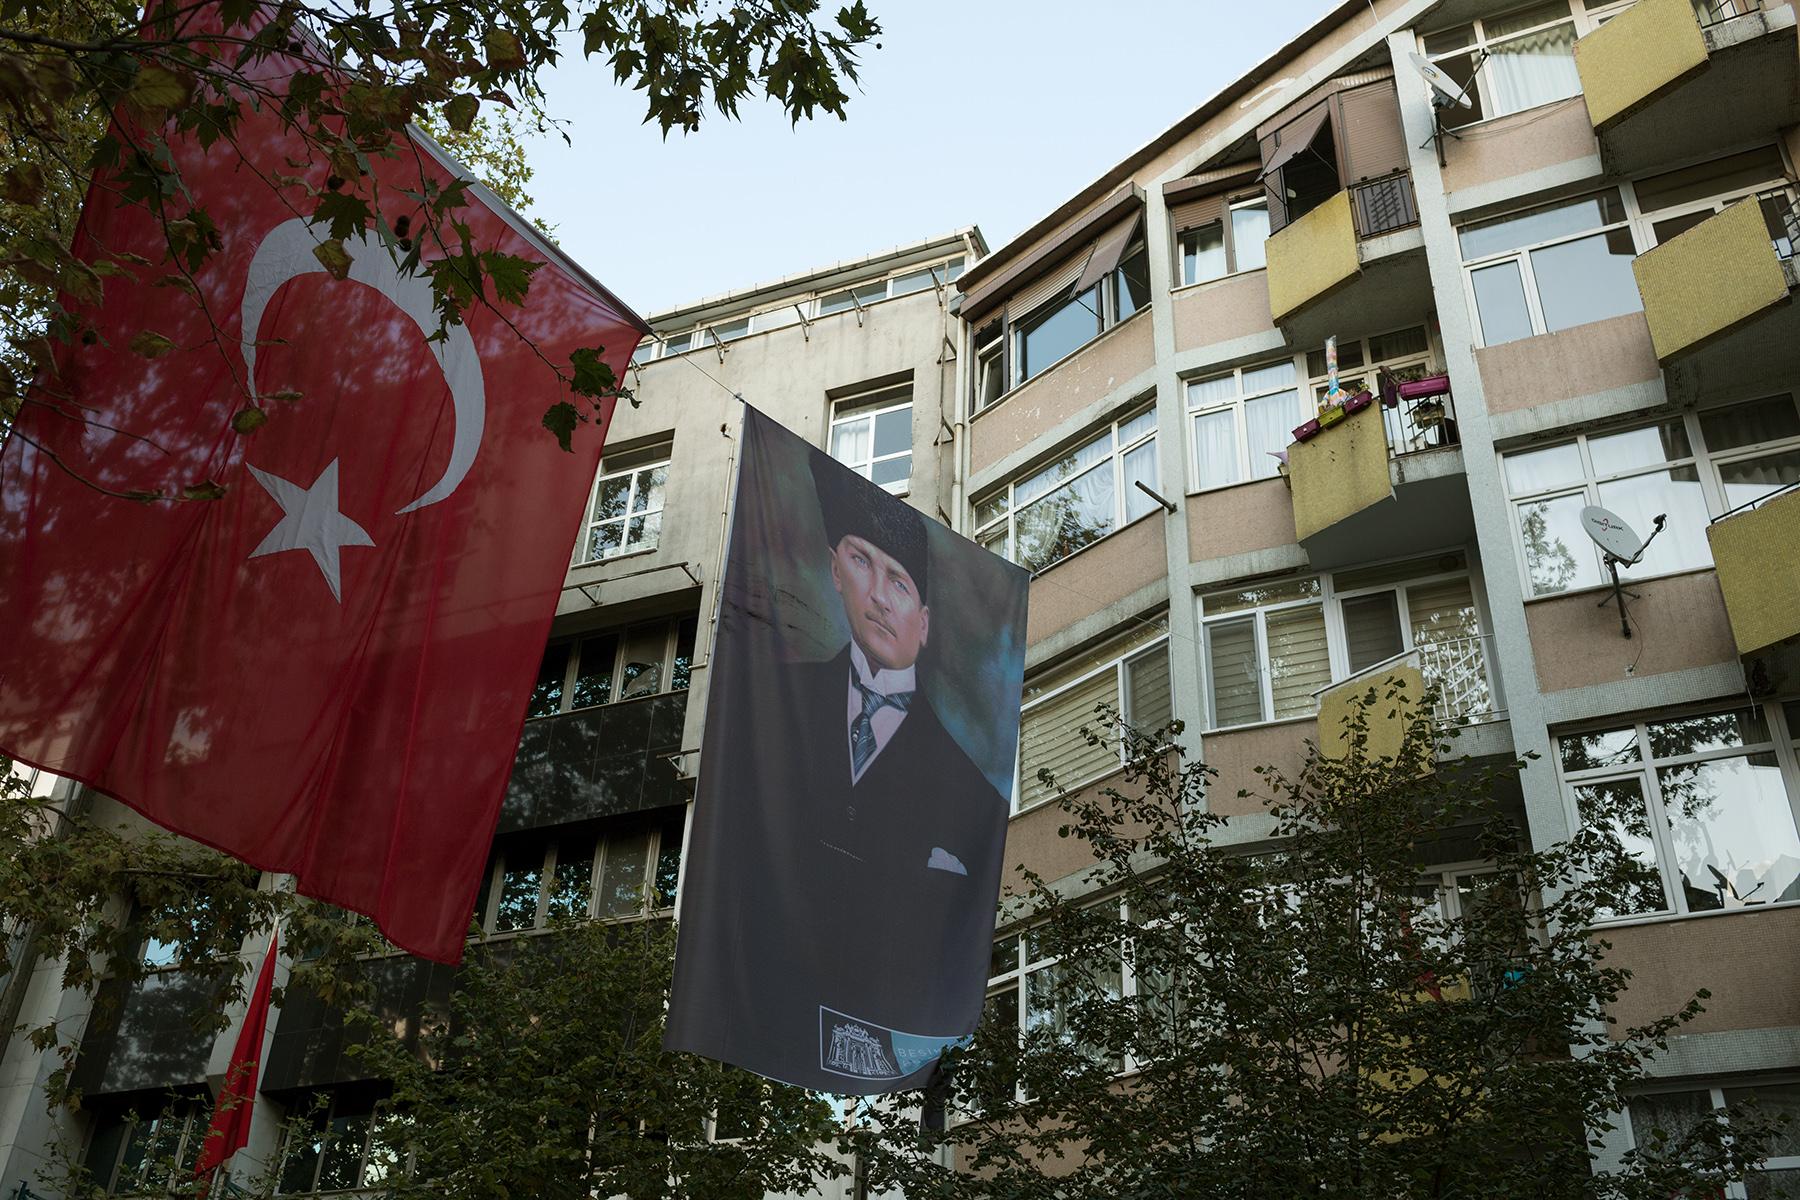 Turkey, October 2017 - Besiktas, a secular district of Istanbul before the festivities for Atatürk's death anniversary.